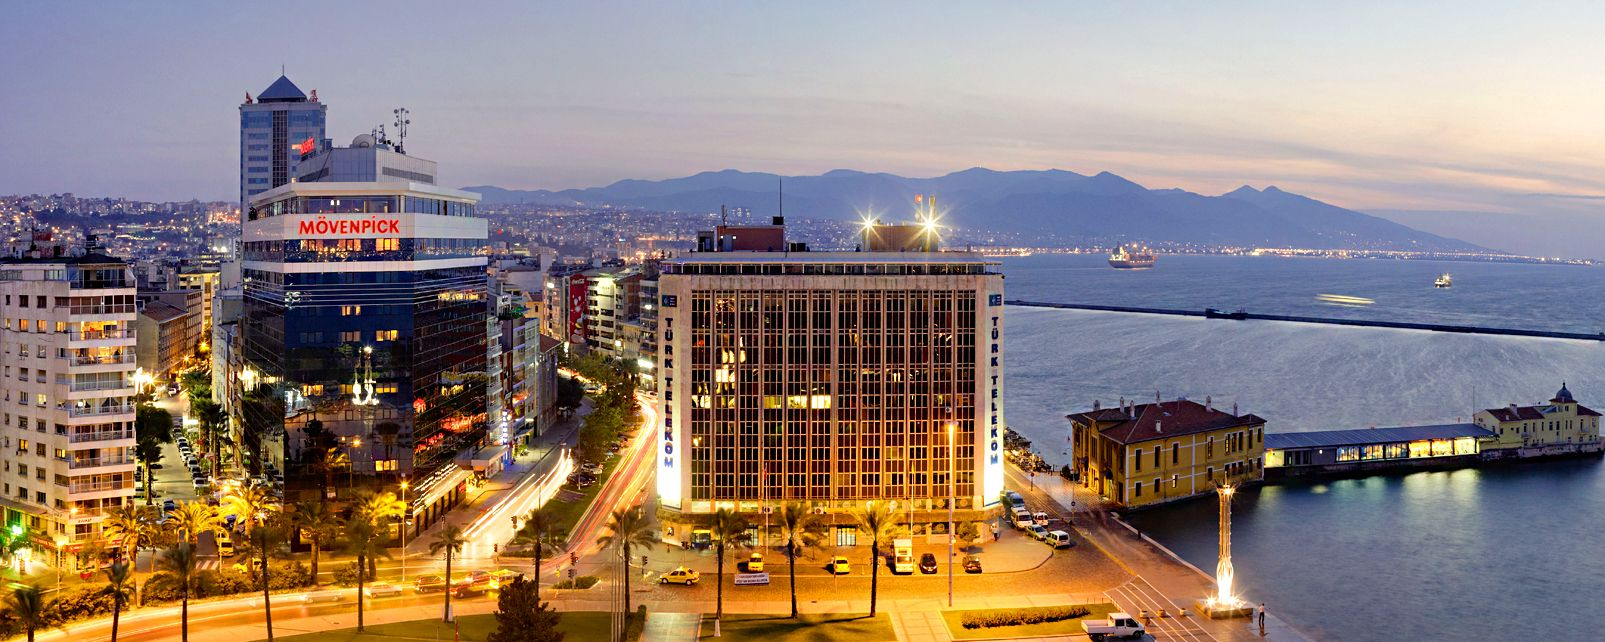 Hotel Mövenpick Hotel Izmir